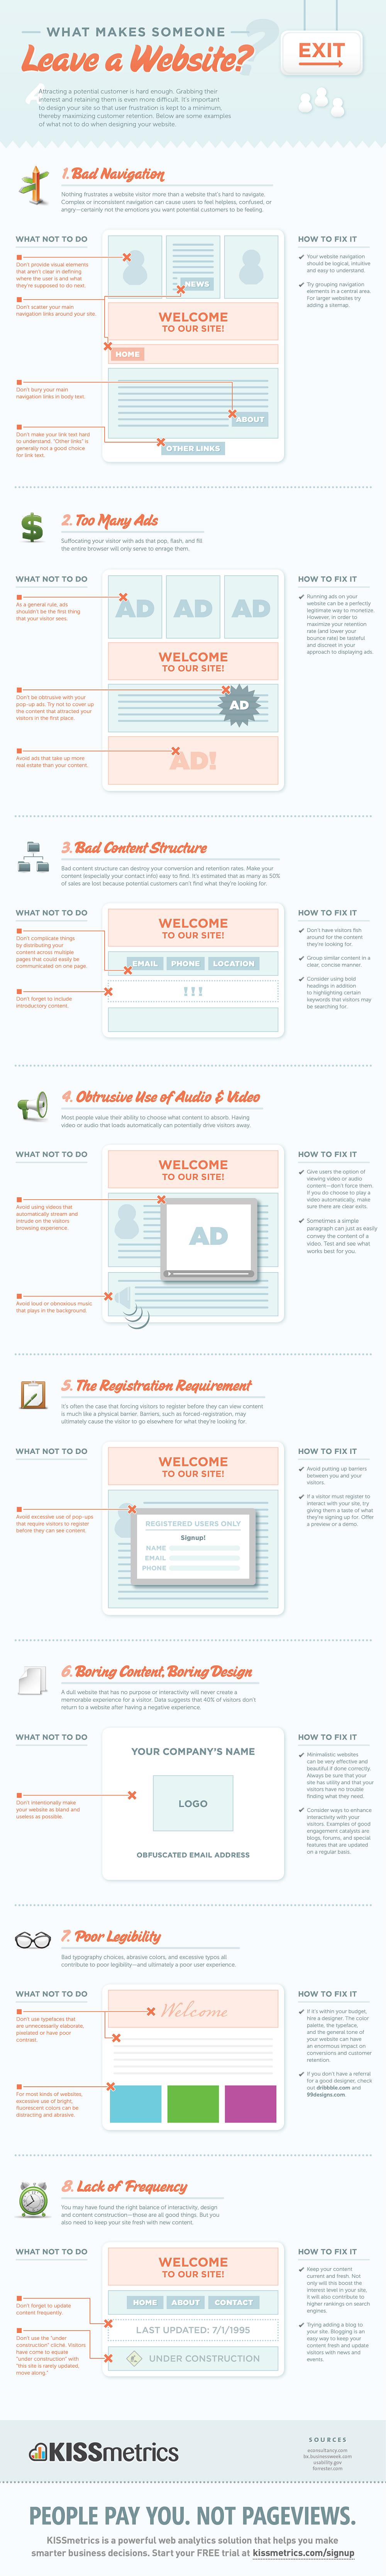 8 Best Ways to Improve Traffic on a Website